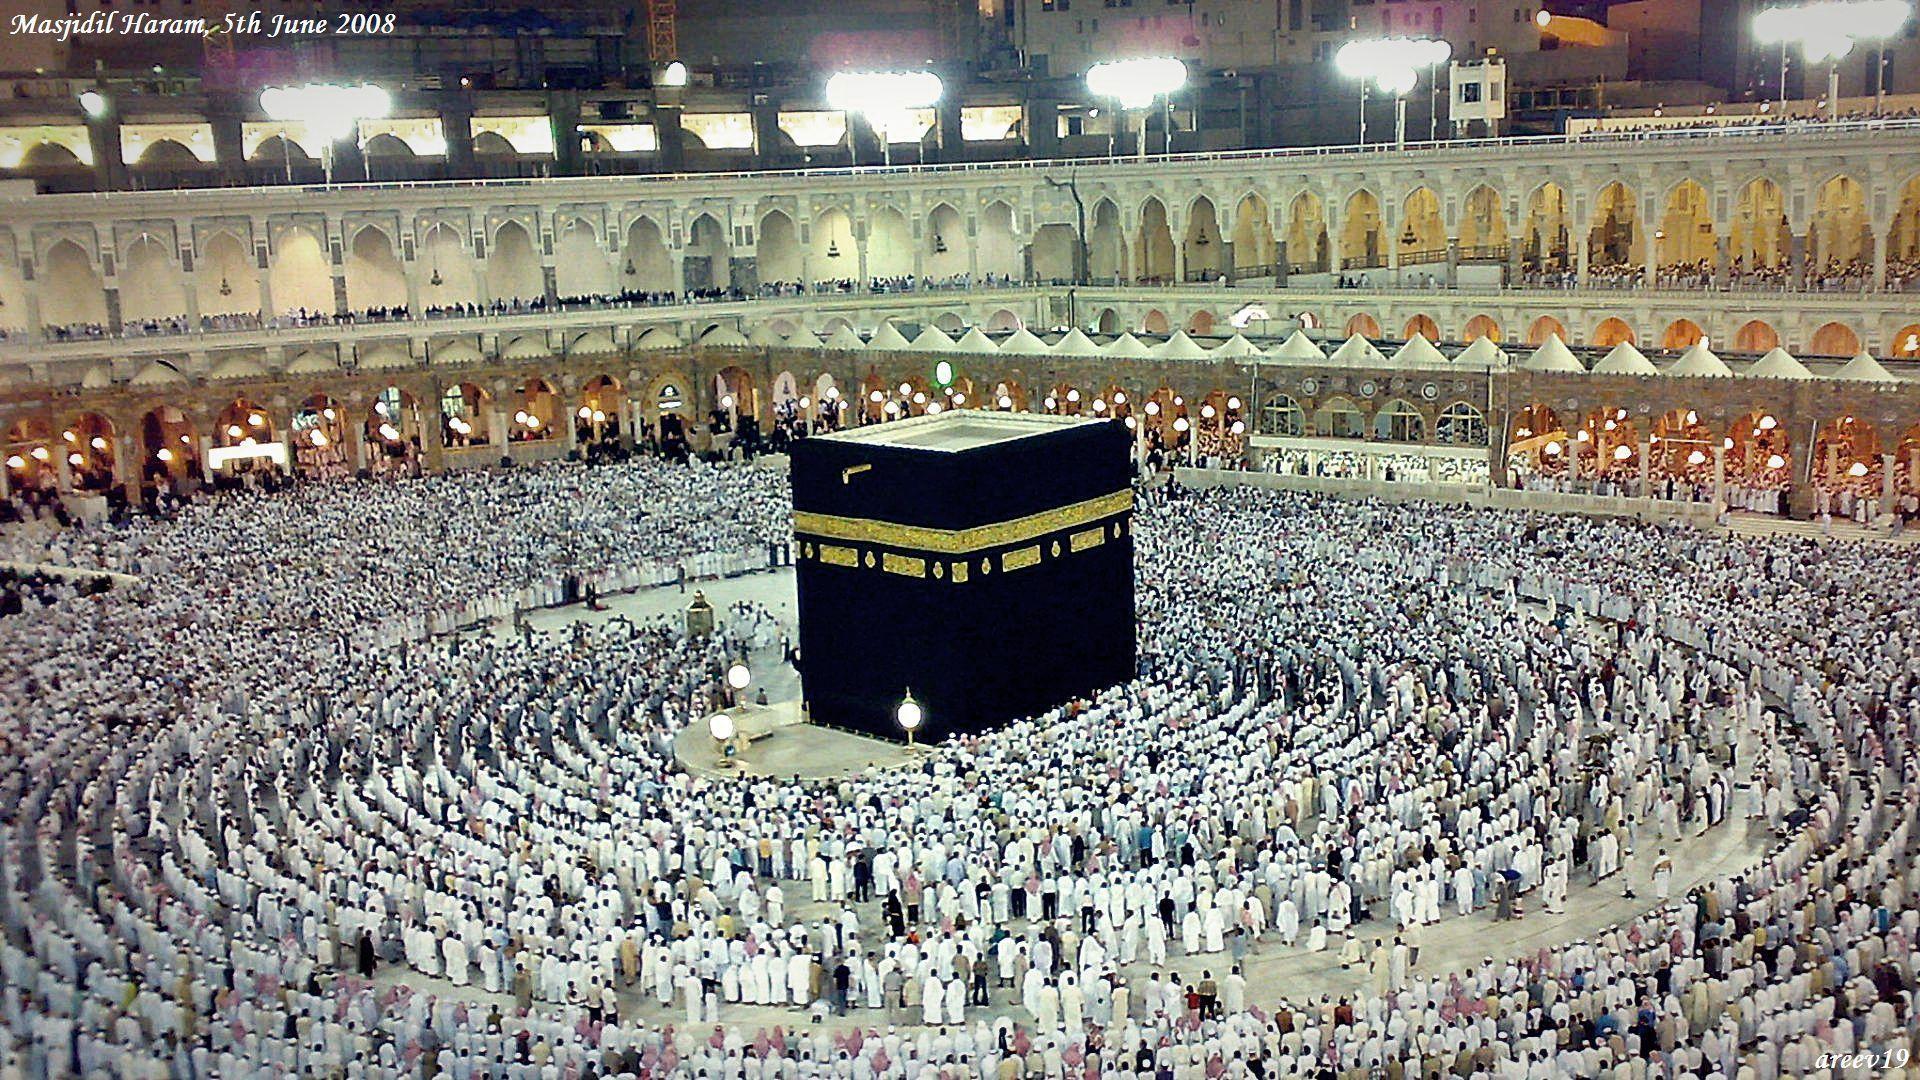 DeviantArt: More Like Masjid al-Haram - Mecca (wallpaper) by areev19